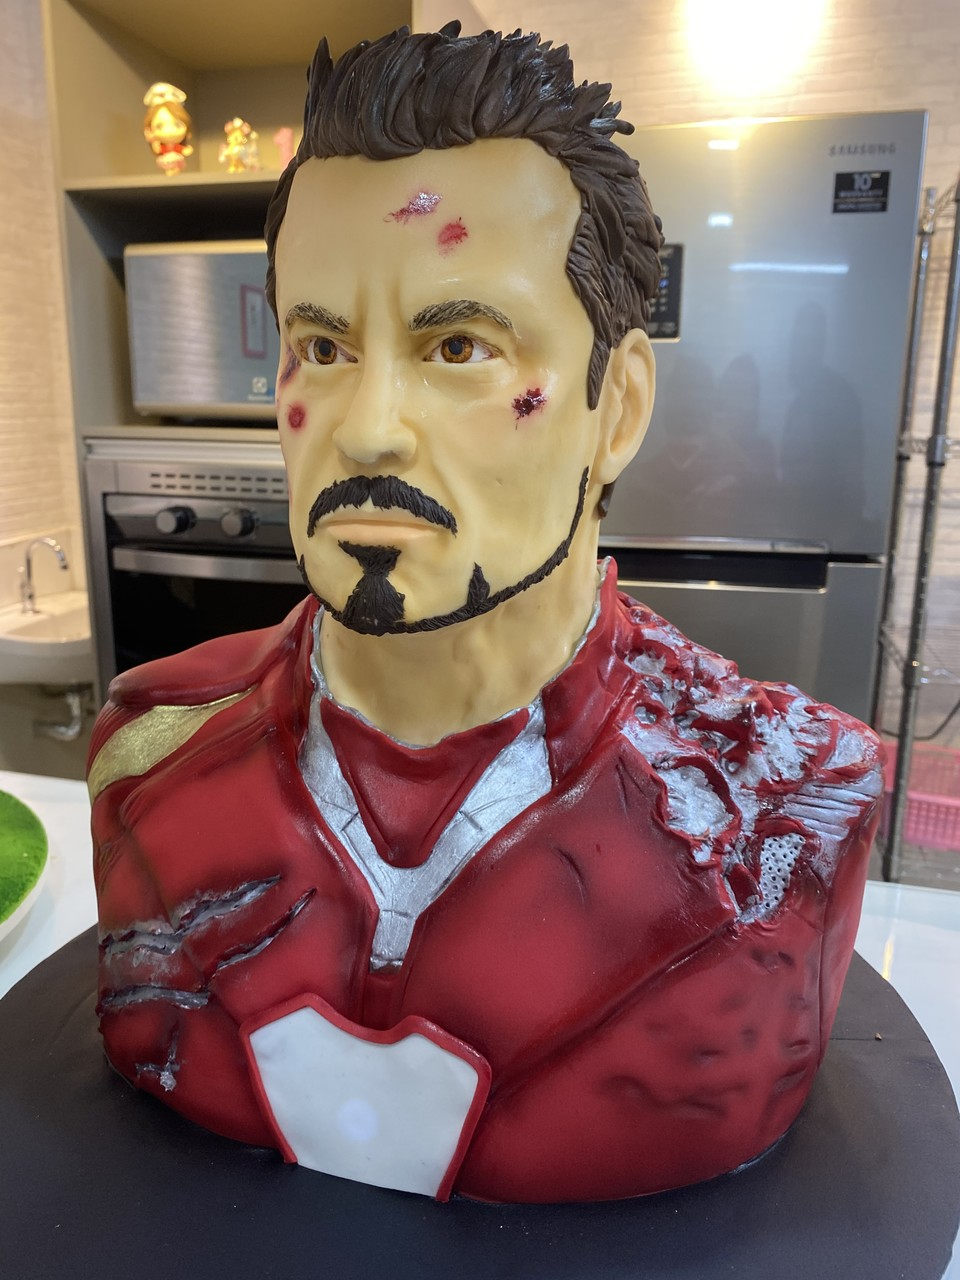 Bolo Homem de Ferro Iron Man Tony Stark: Vingadores Ultimato Avangers Endgame Marvel - Geek Cake - EV